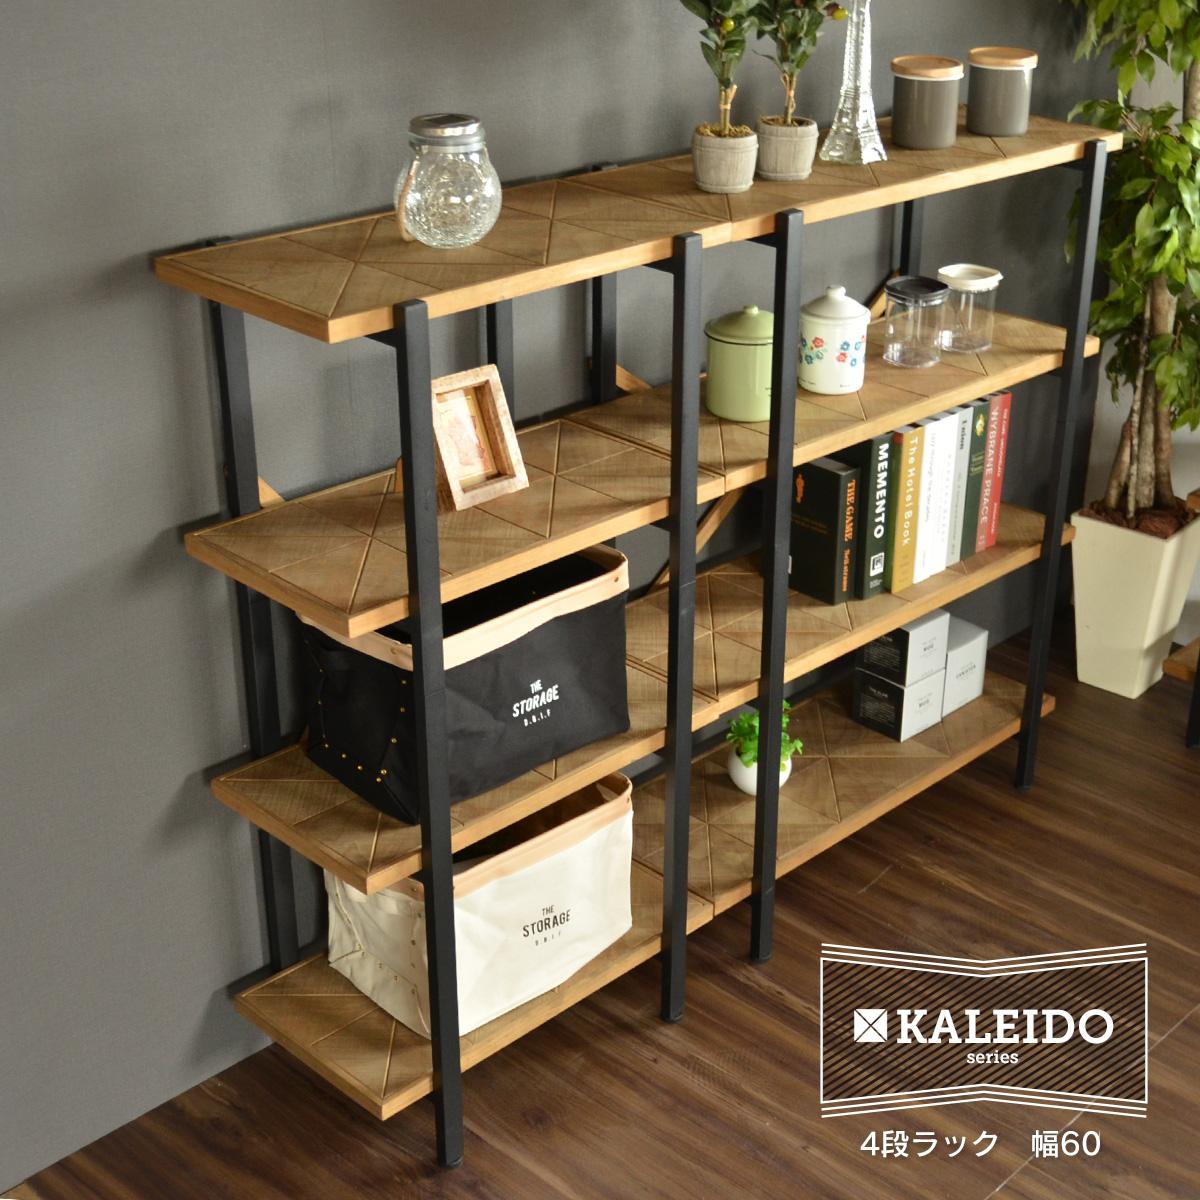 KALEIDO カレイド 4段ラック 幅60 オープン 収納 木製 棚 本棚 シェルフ 間仕切り ディスプレイ コンパクト スリム 省スペース 一人暮らし リビング おしゃれ デザイン